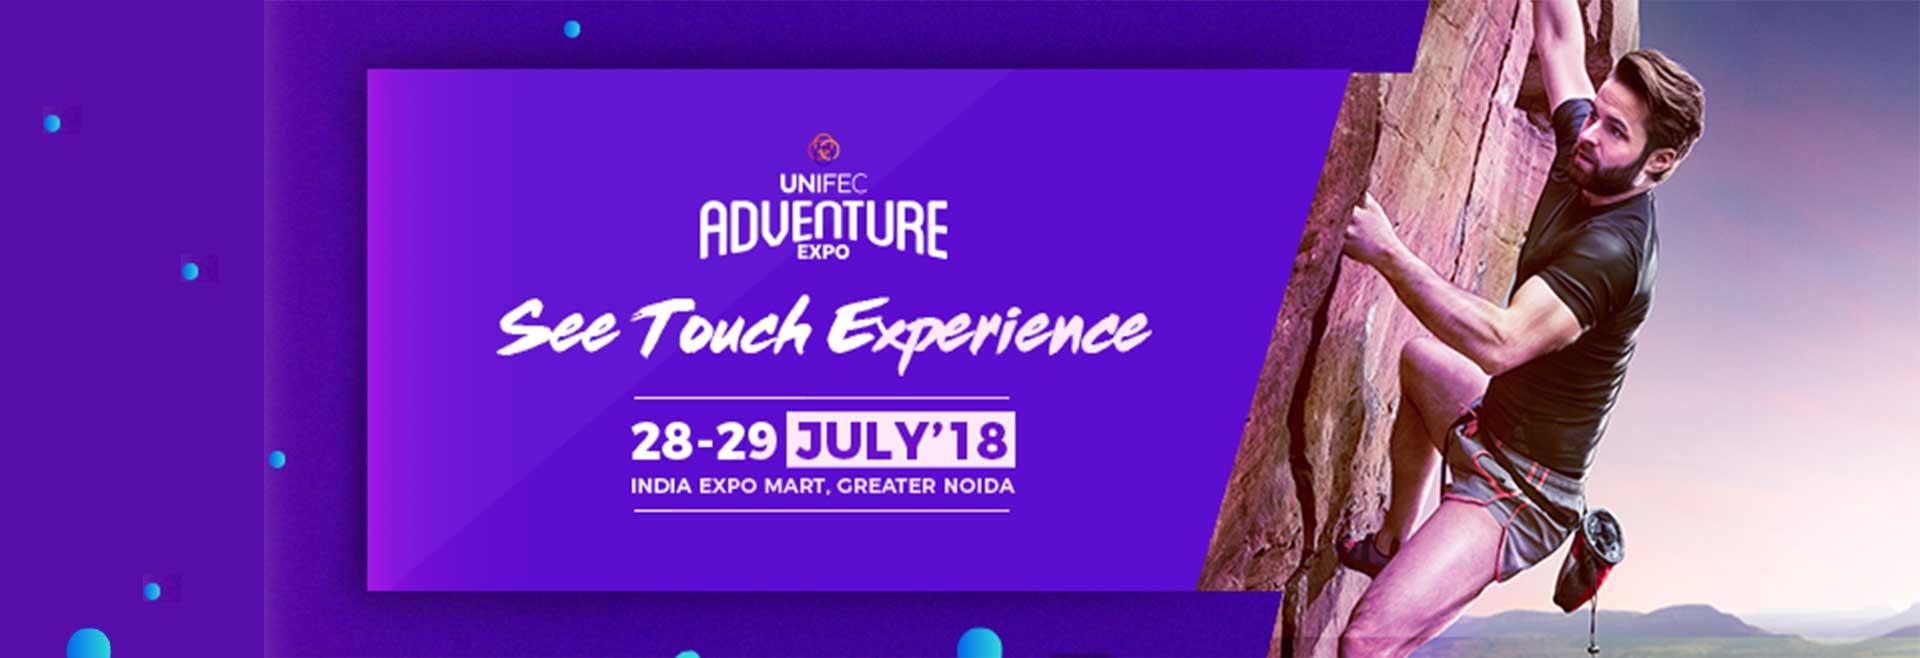 UNIFEC Adventure Expo